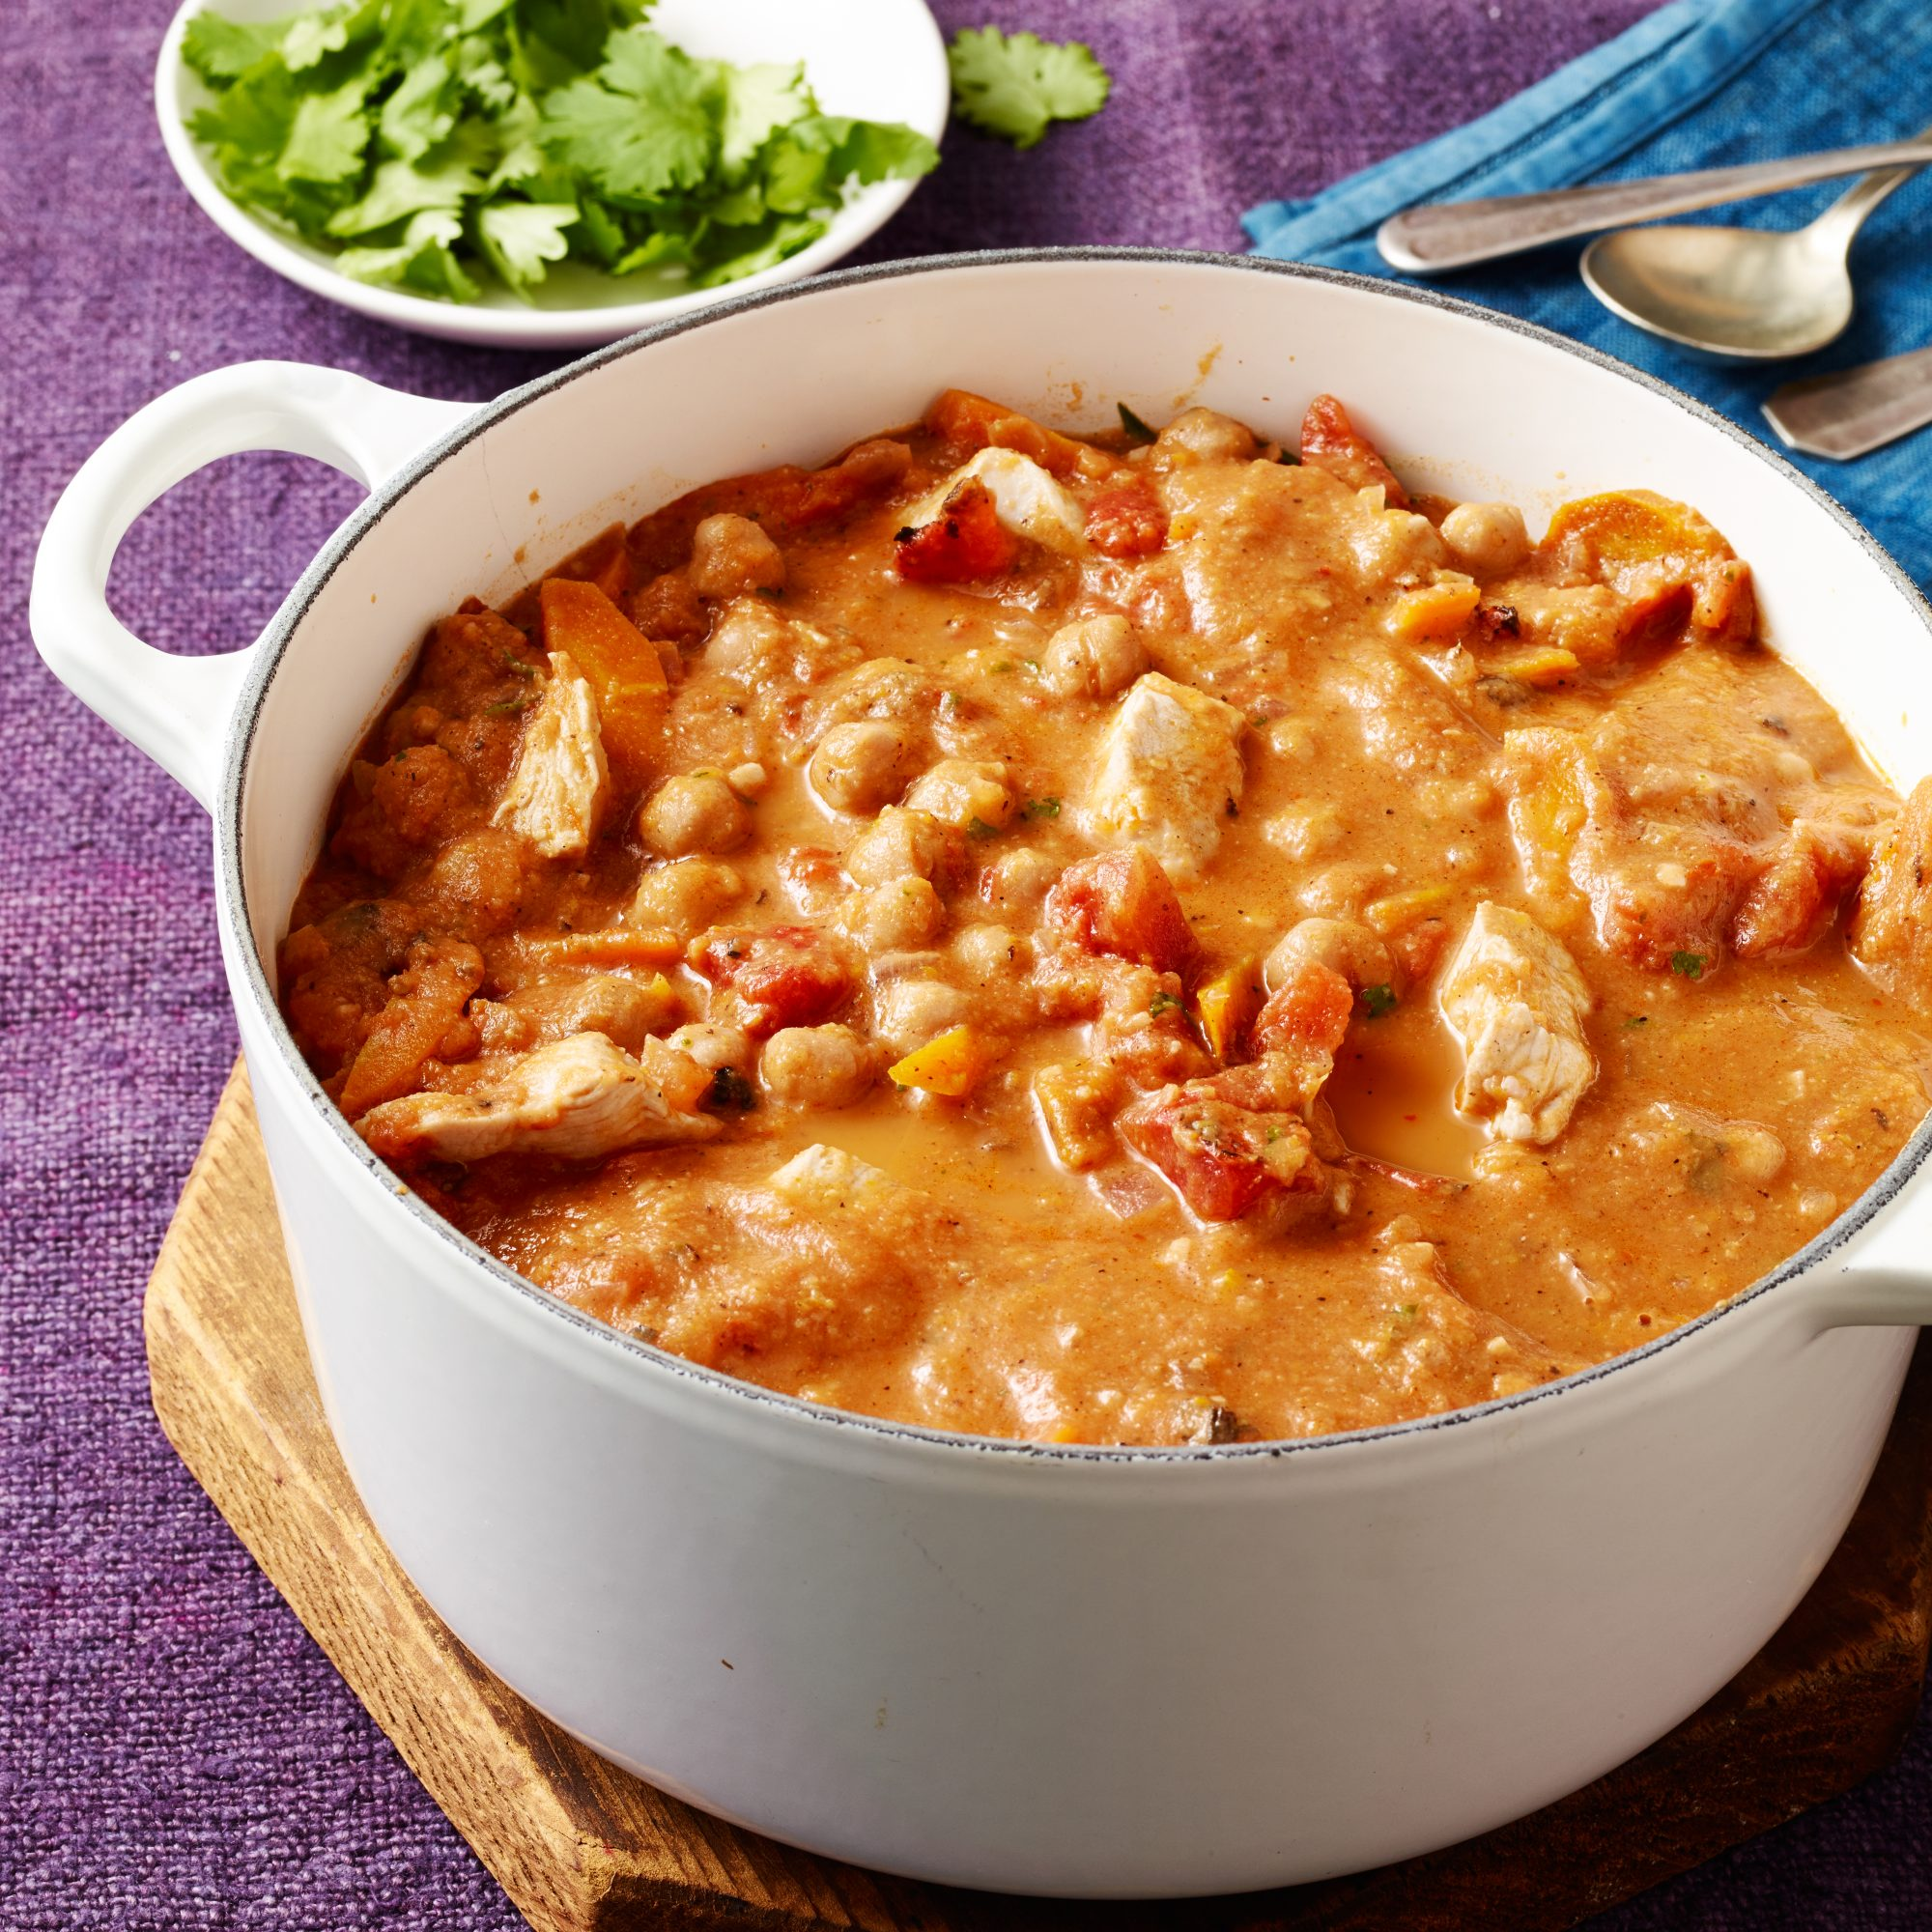 Moroccan Chicken & Chickpea Stew